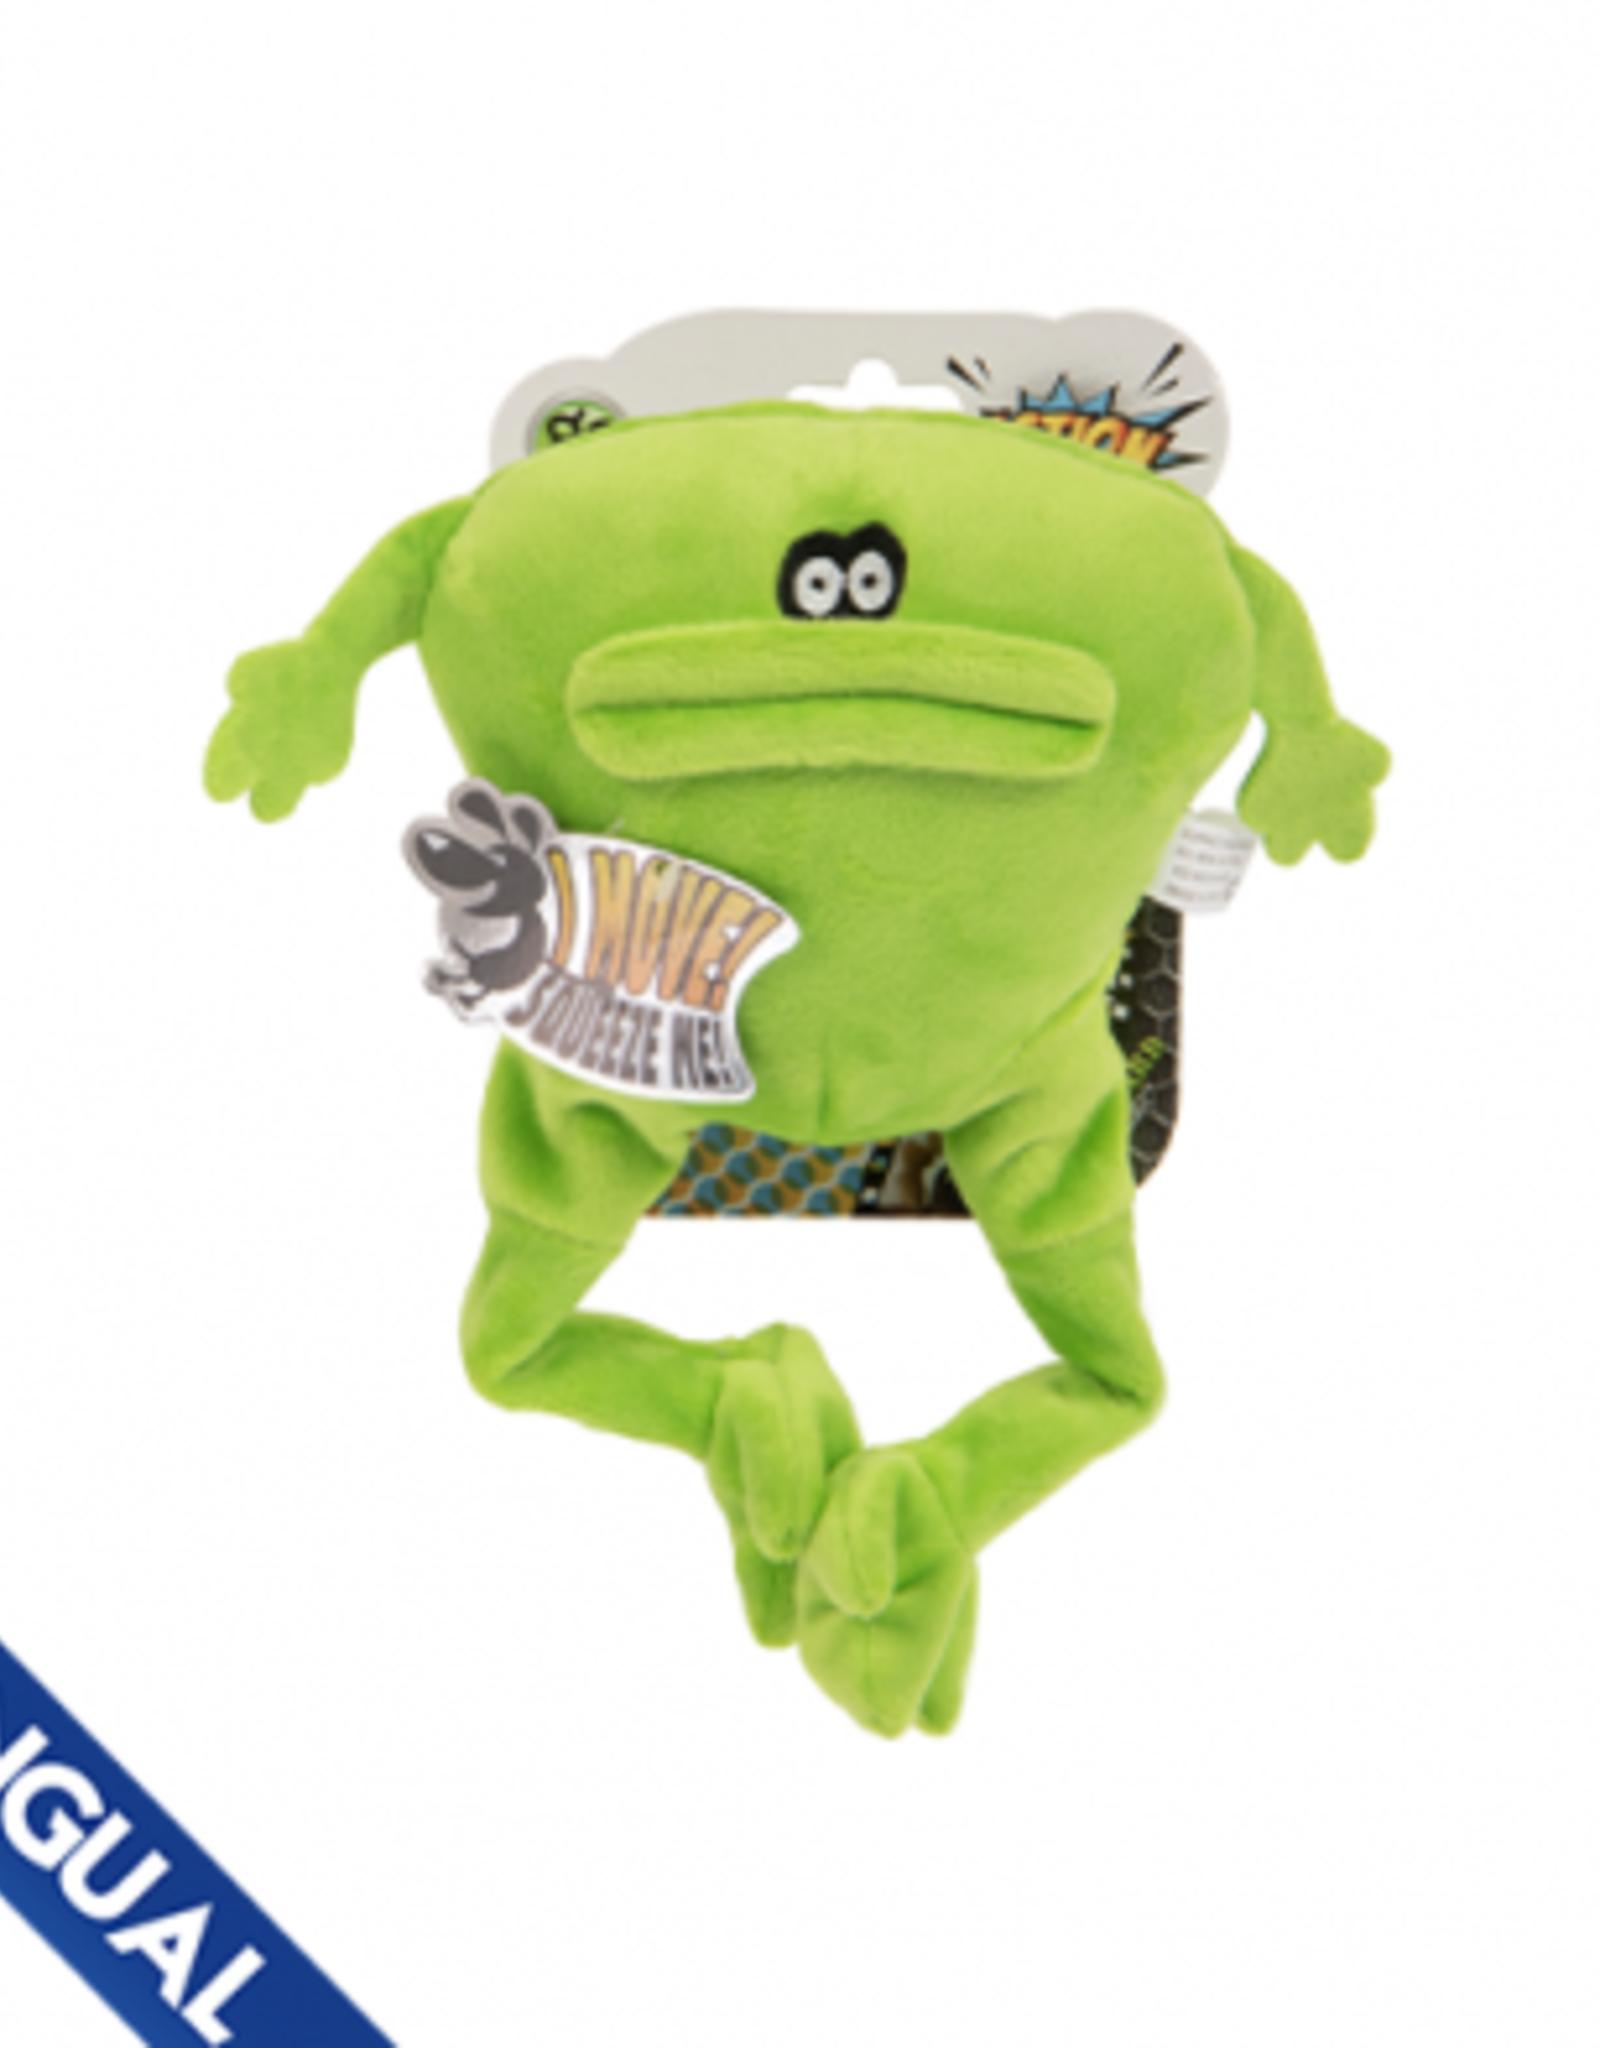 GoDog Go Dog Chew Guard Action Plus Frog